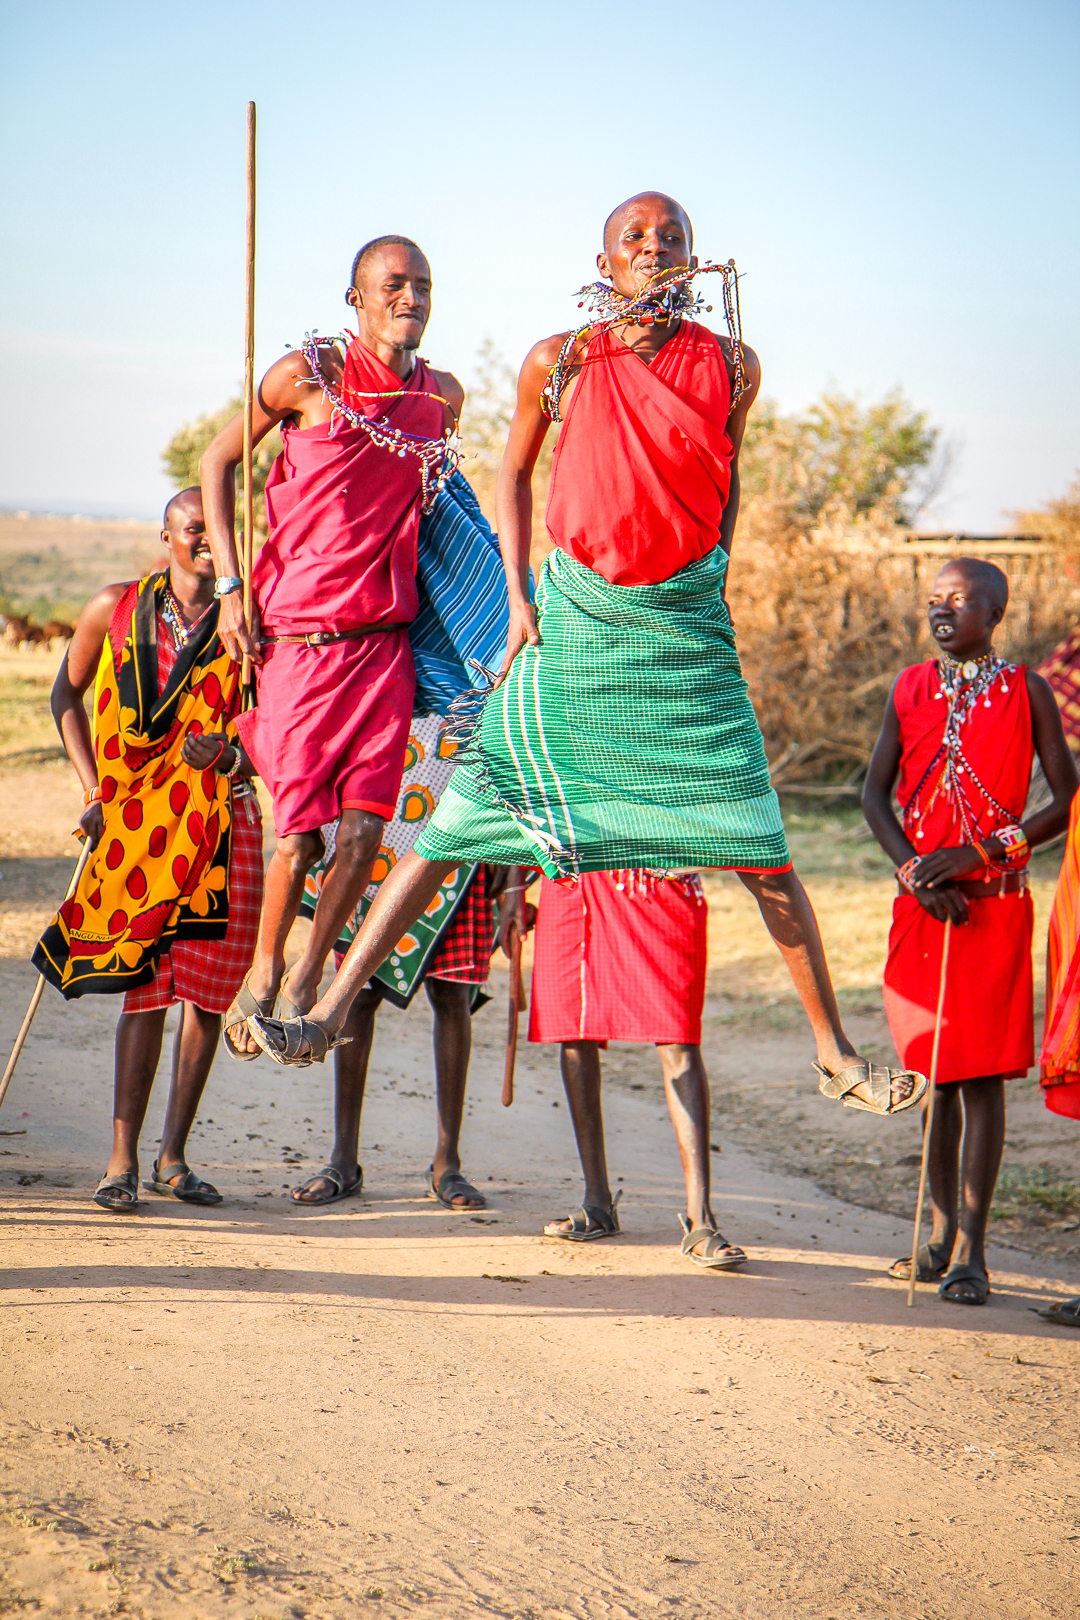 IMG_6169_Kenia_Masai Mara